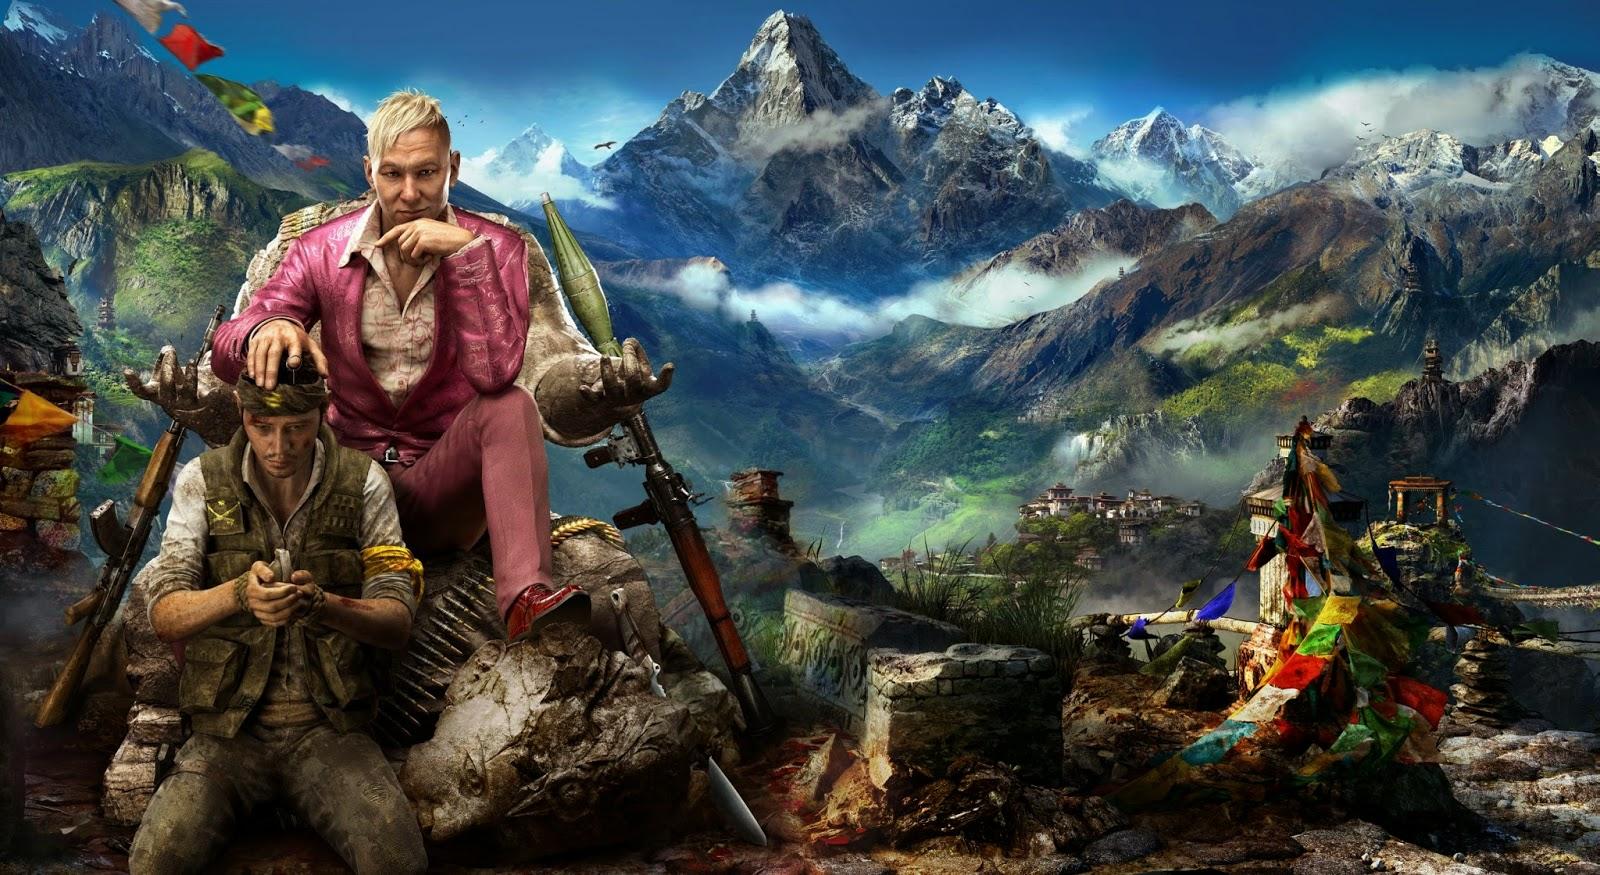 Far Cry 4 Artwork HD Wallpaper